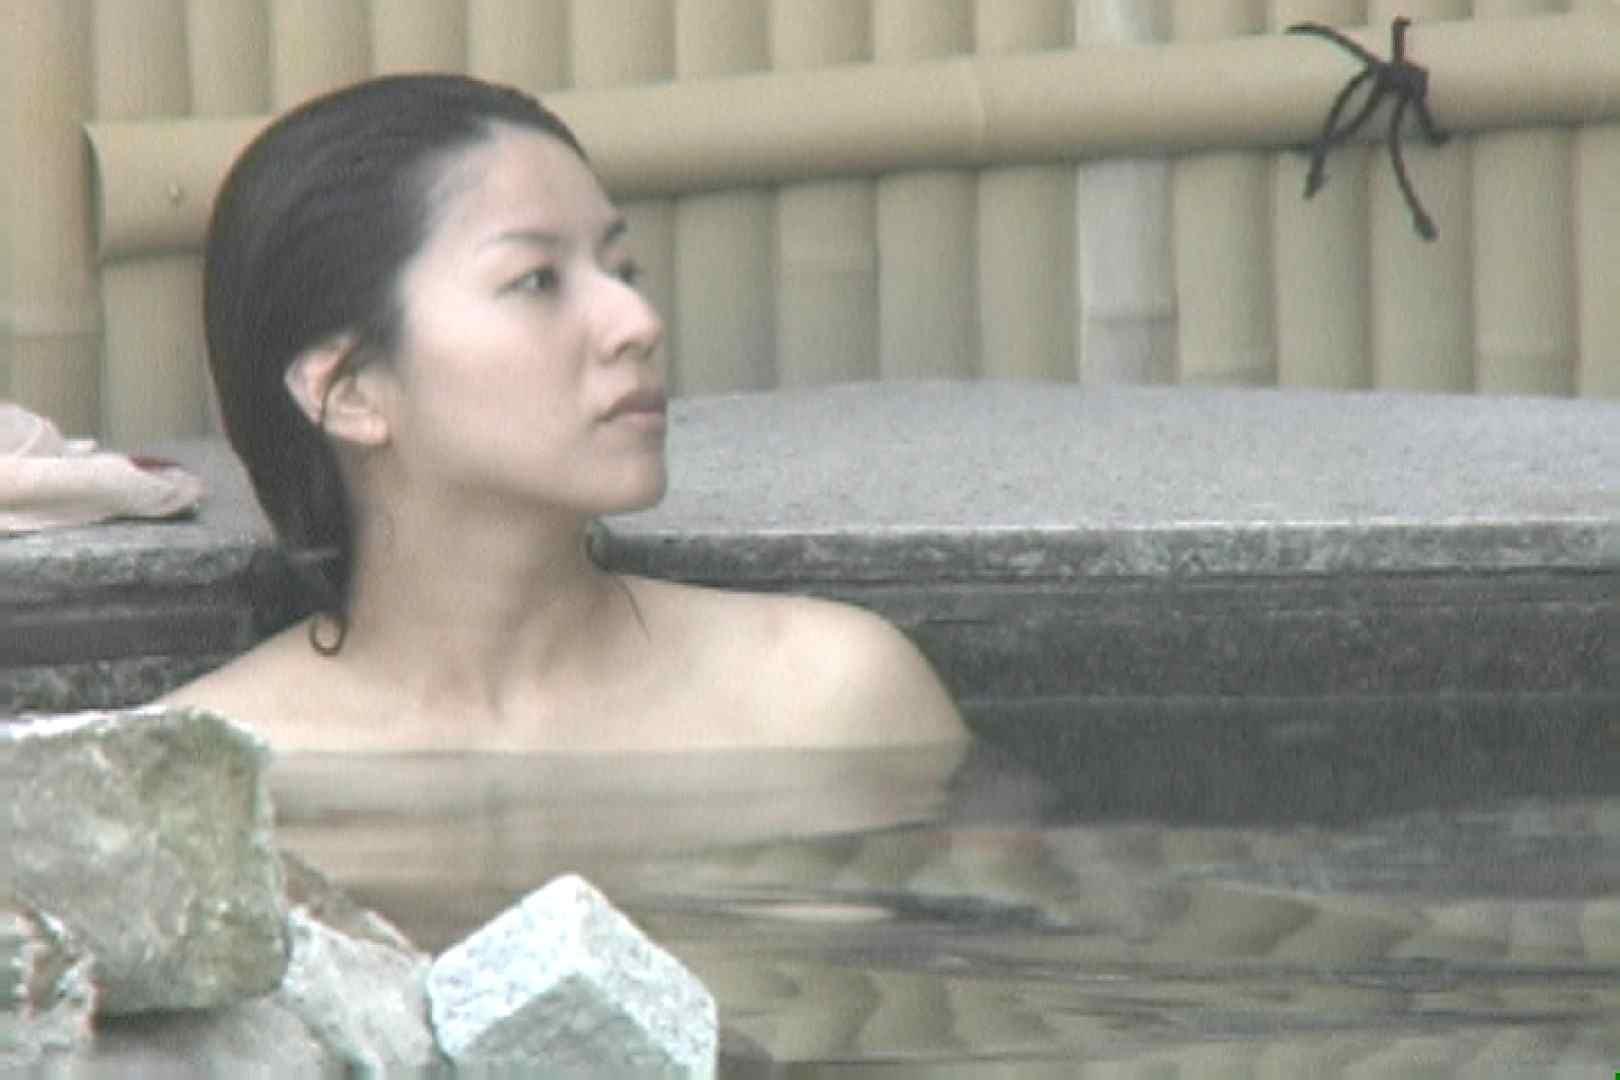 Aquaな露天風呂Vol.694 露天 オメコ無修正動画無料 110PICs 17